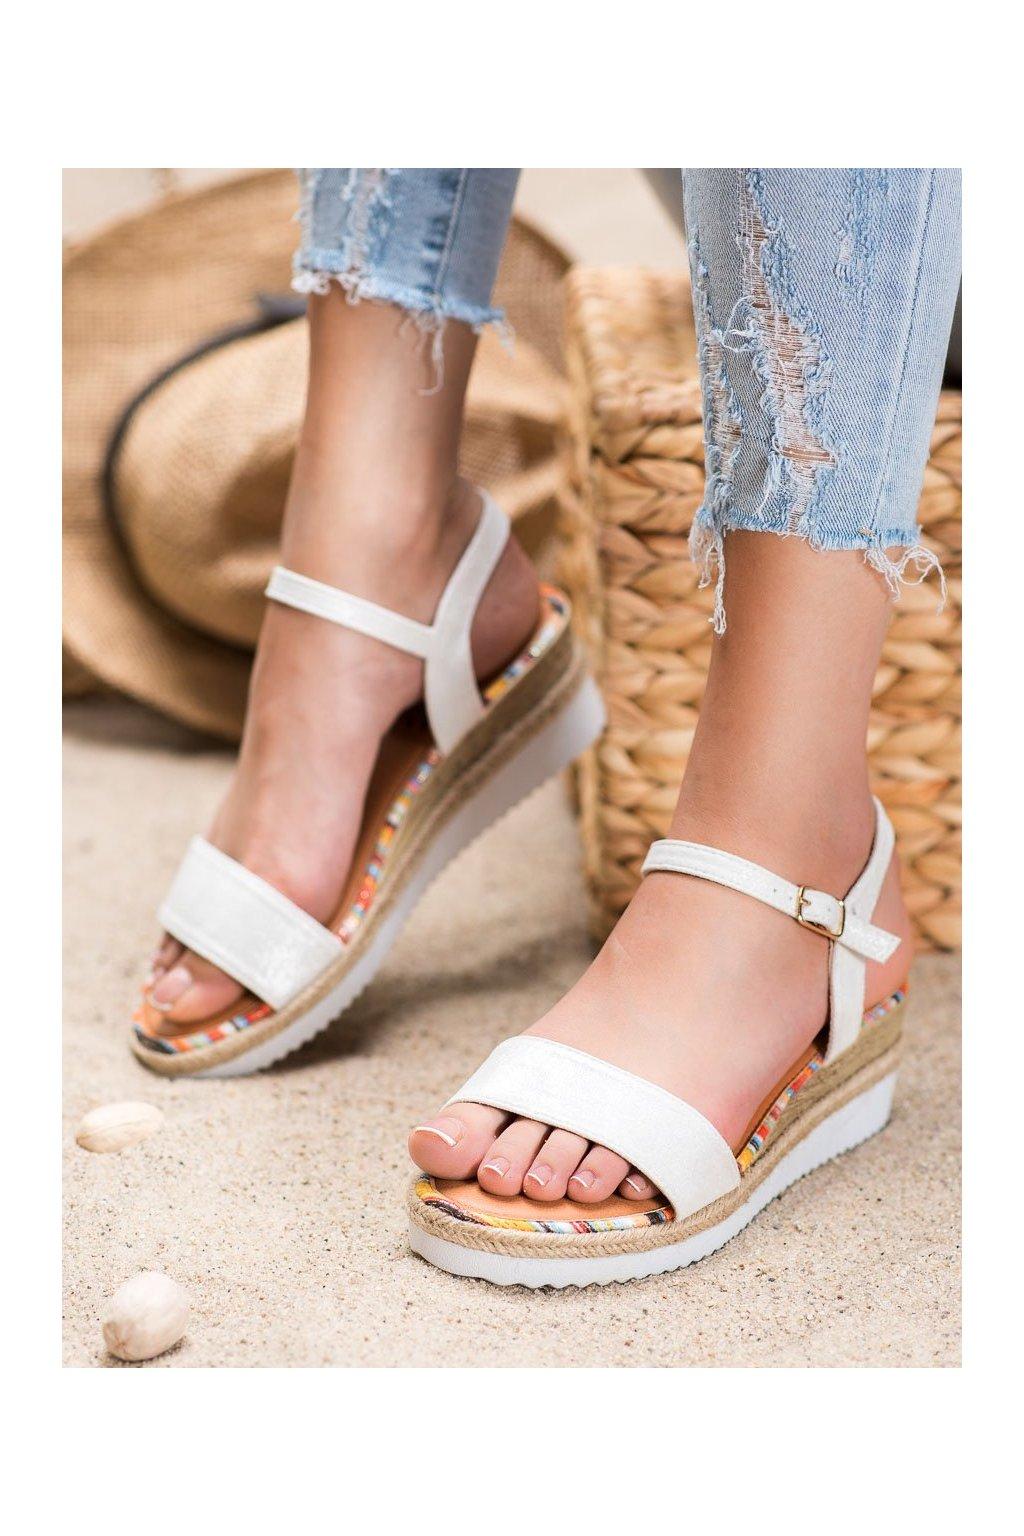 Biele sandále Yes mile kod SS-47W